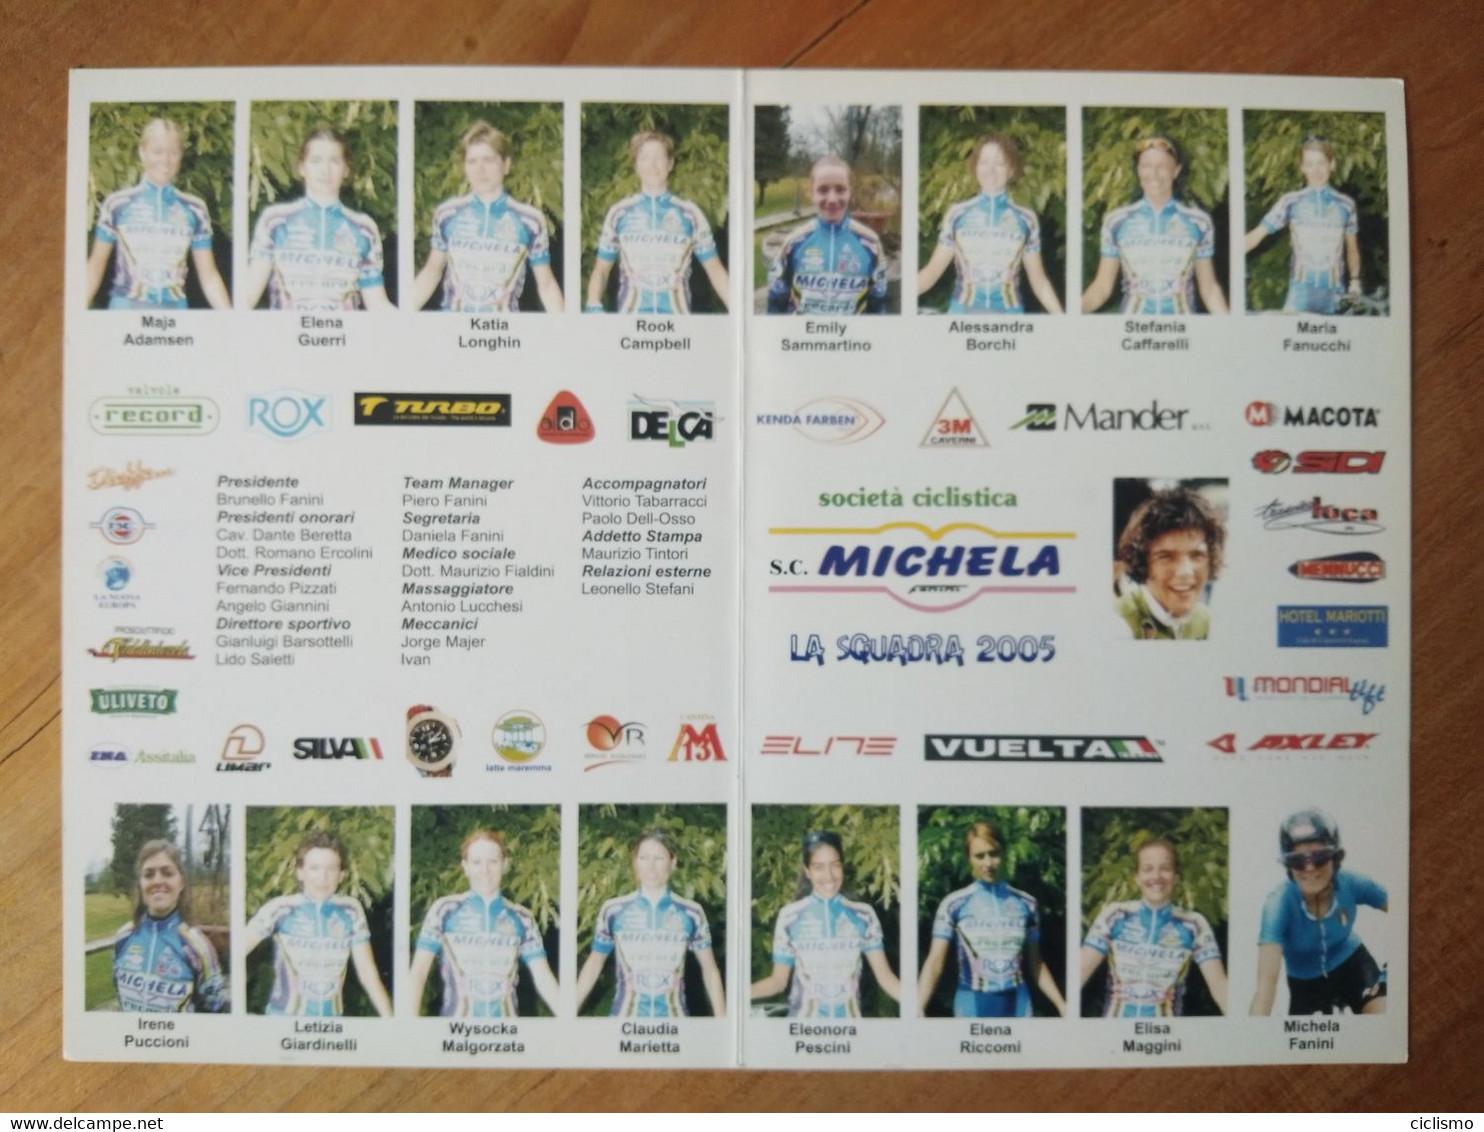 Cyclisme - Carte Publicitaire Recto Verso à Deux Volets MICHELA FANINI RECORD ROX 2005 : Le Groupe - Cycling